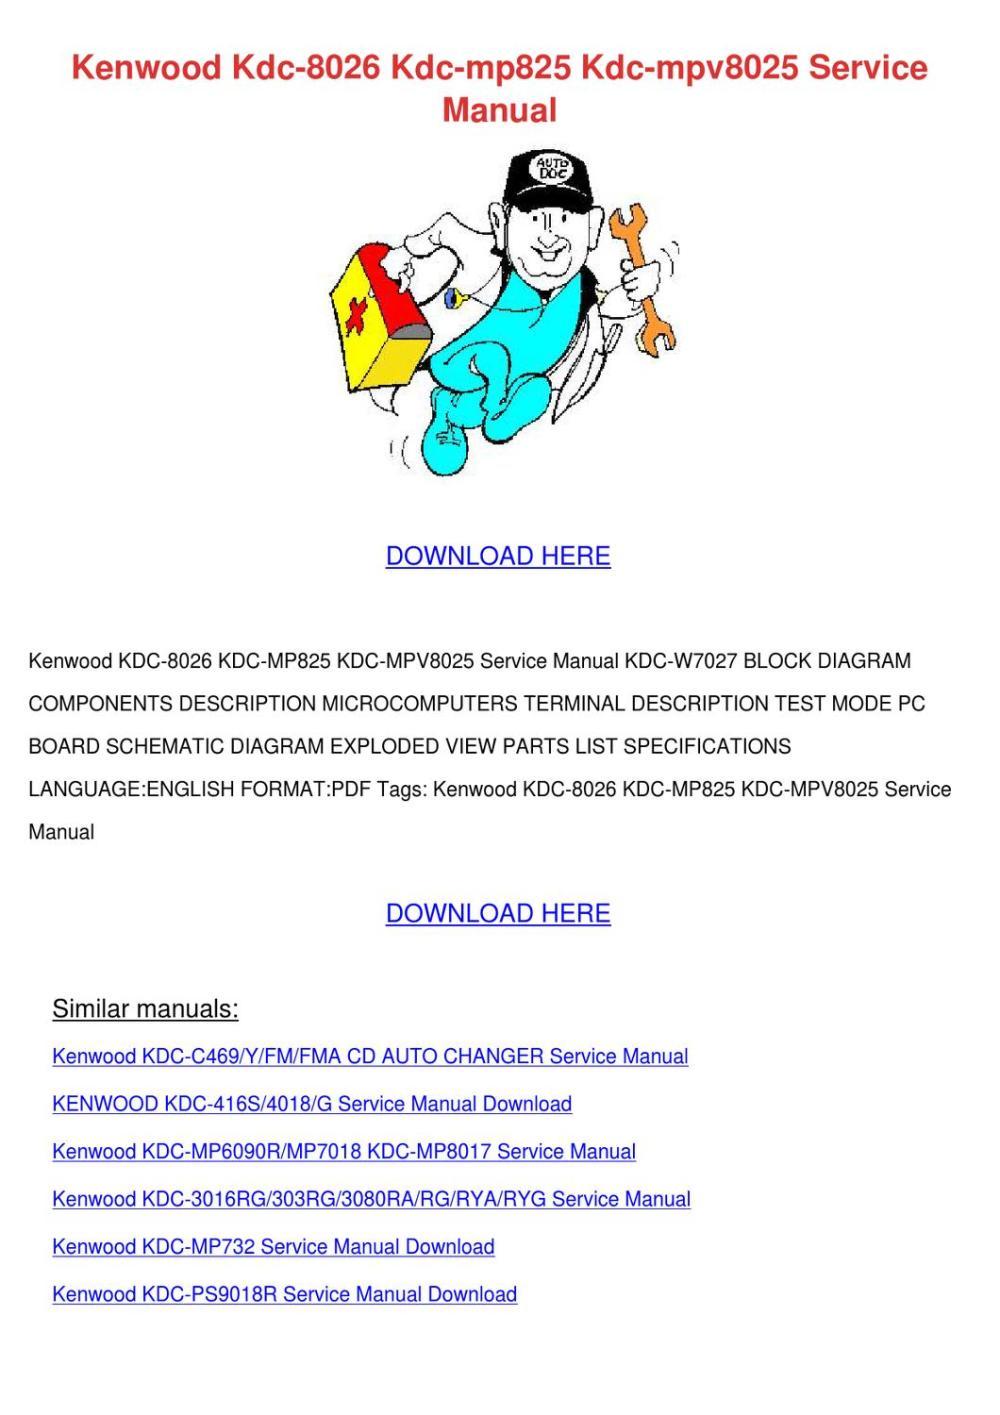 medium resolution of kenwood kdc 8026 kdc mp825 kdc mpv8025 servic